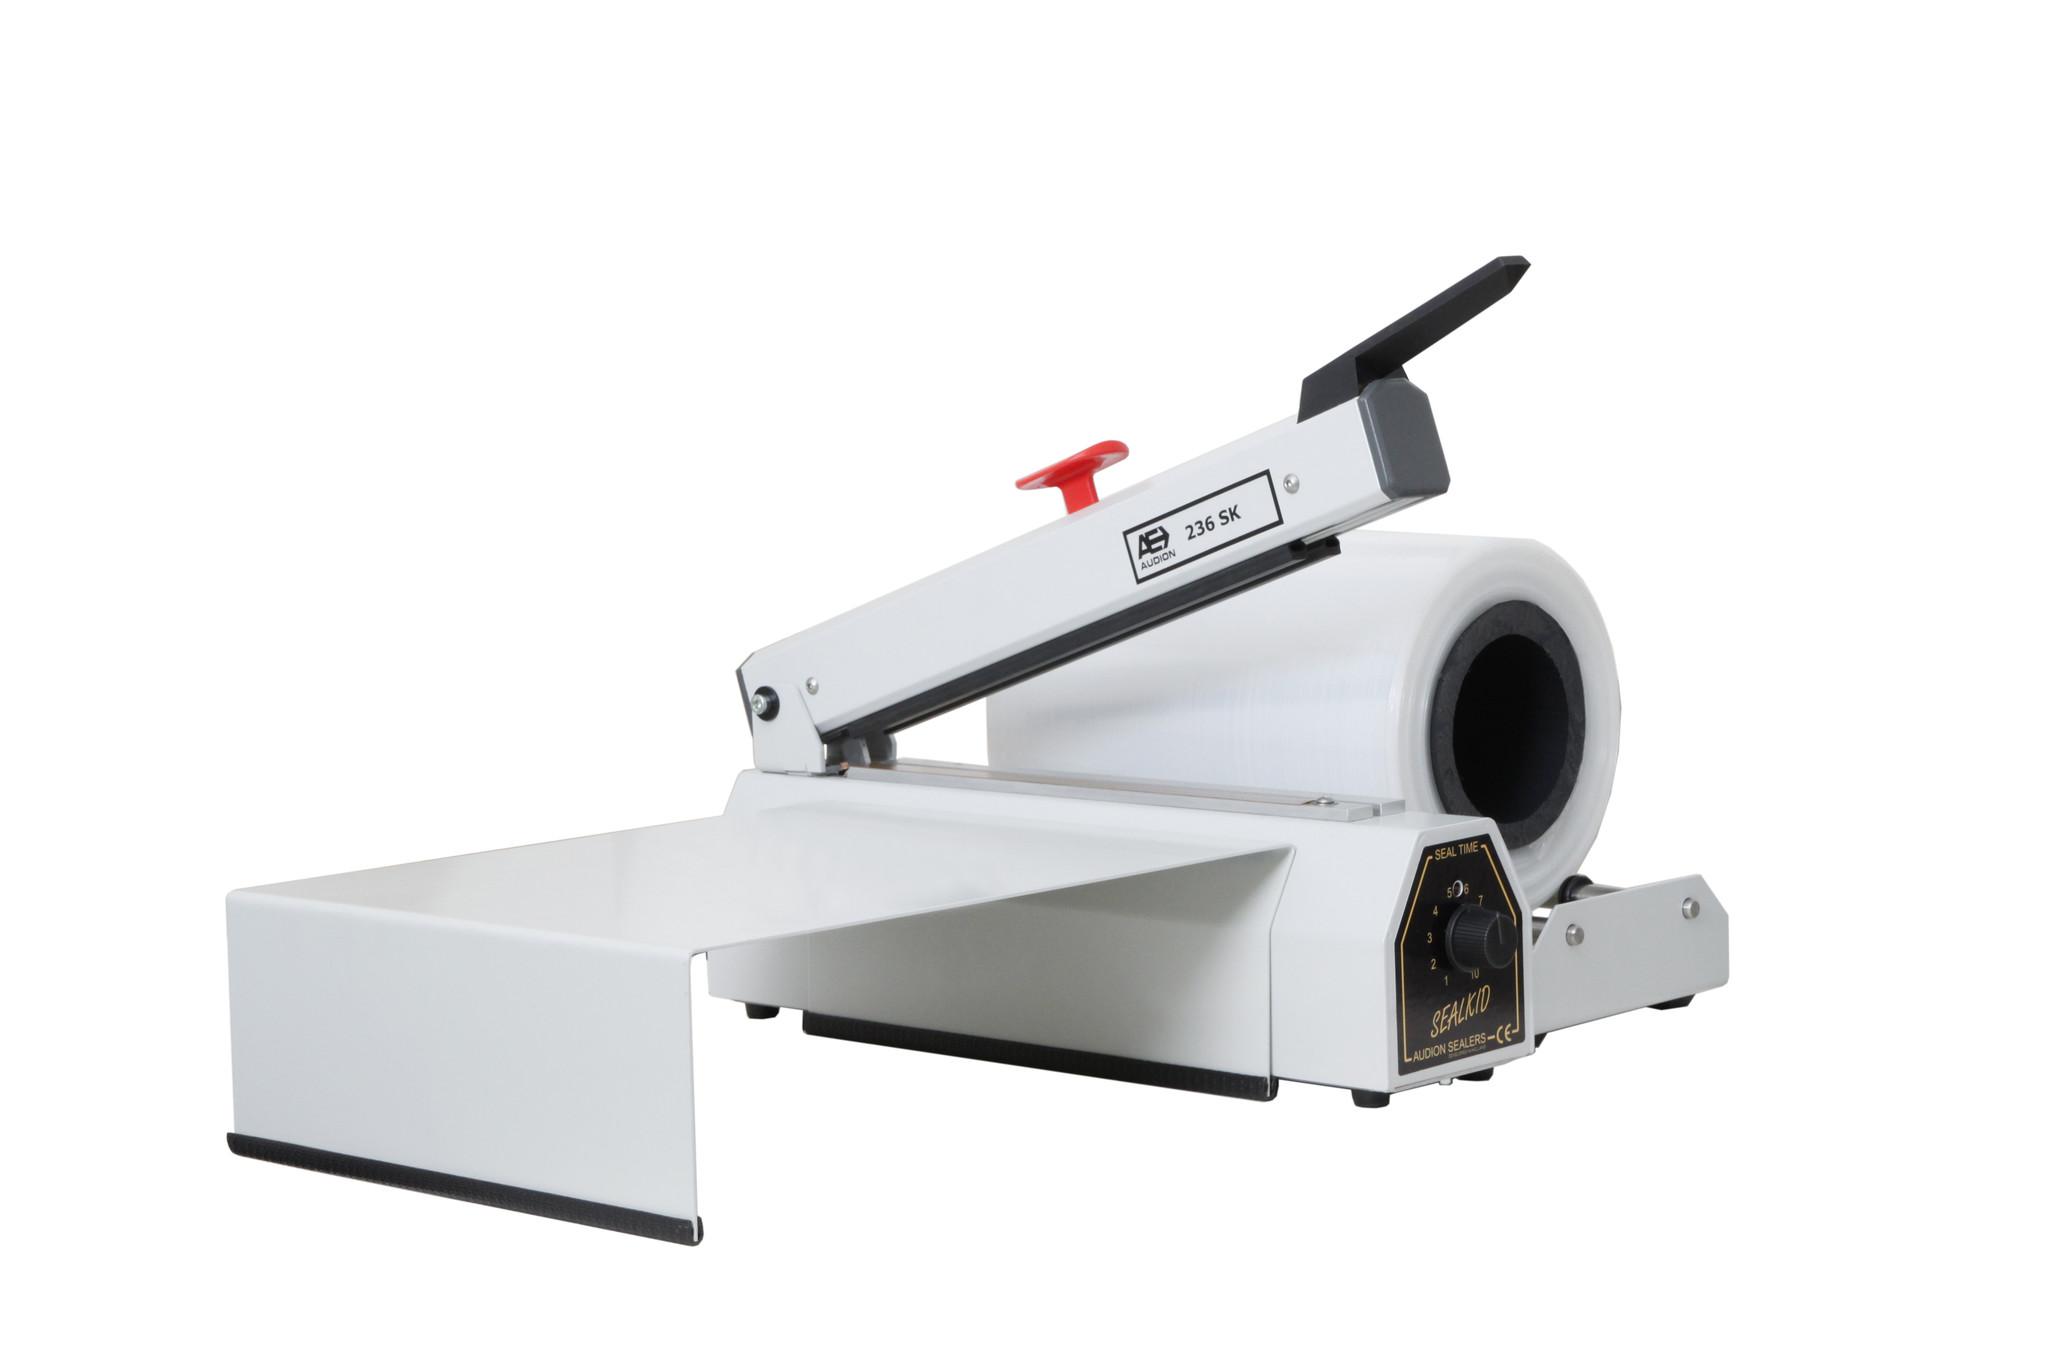 Audion Oplegtafel, type OT 321 SK